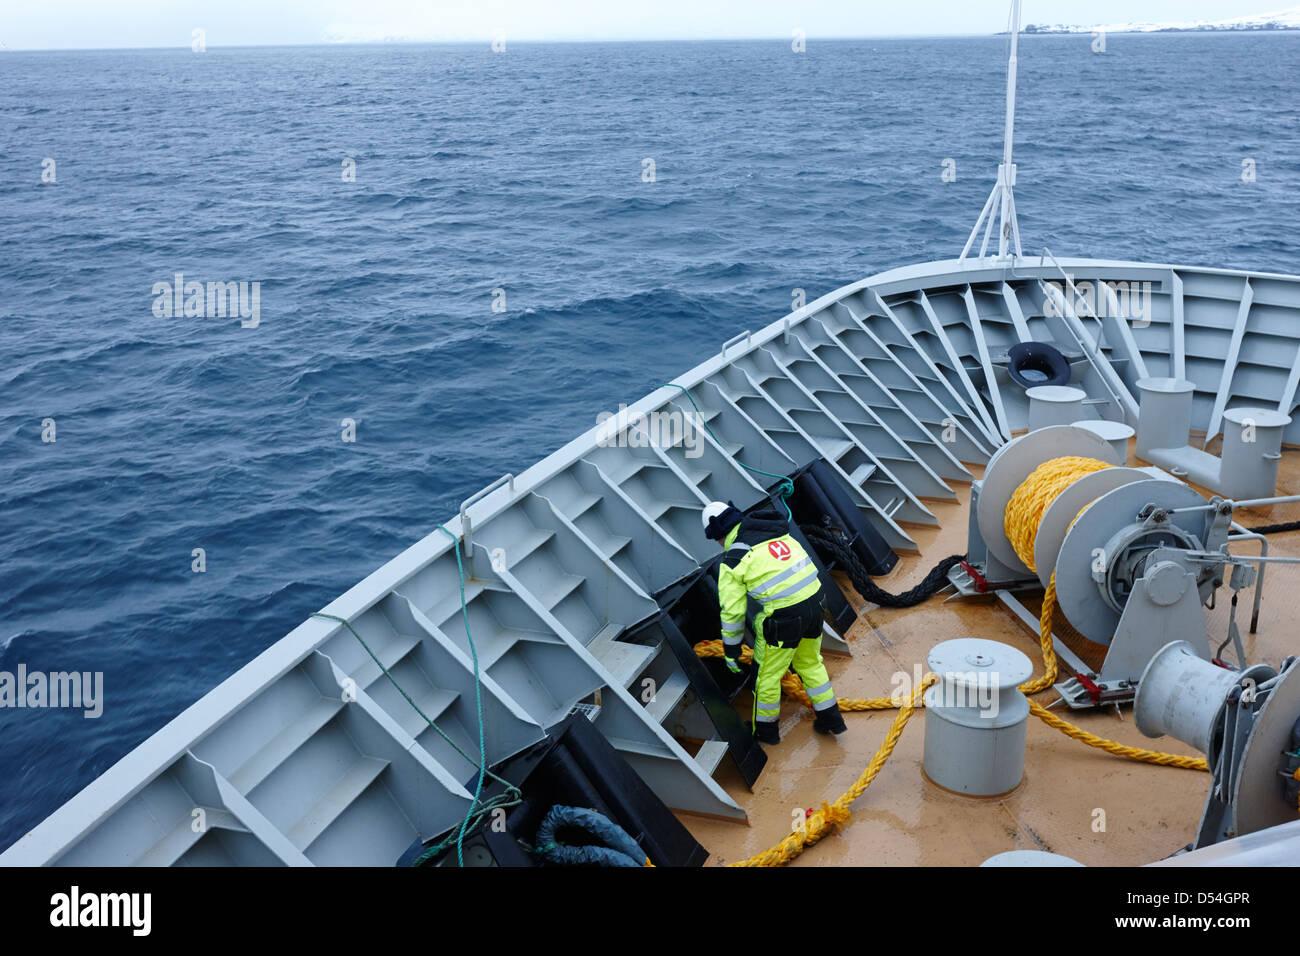 crewman working on ships ropes on board hurtigruten passenger ship sailing through fjords during winter norway europe - Stock Image